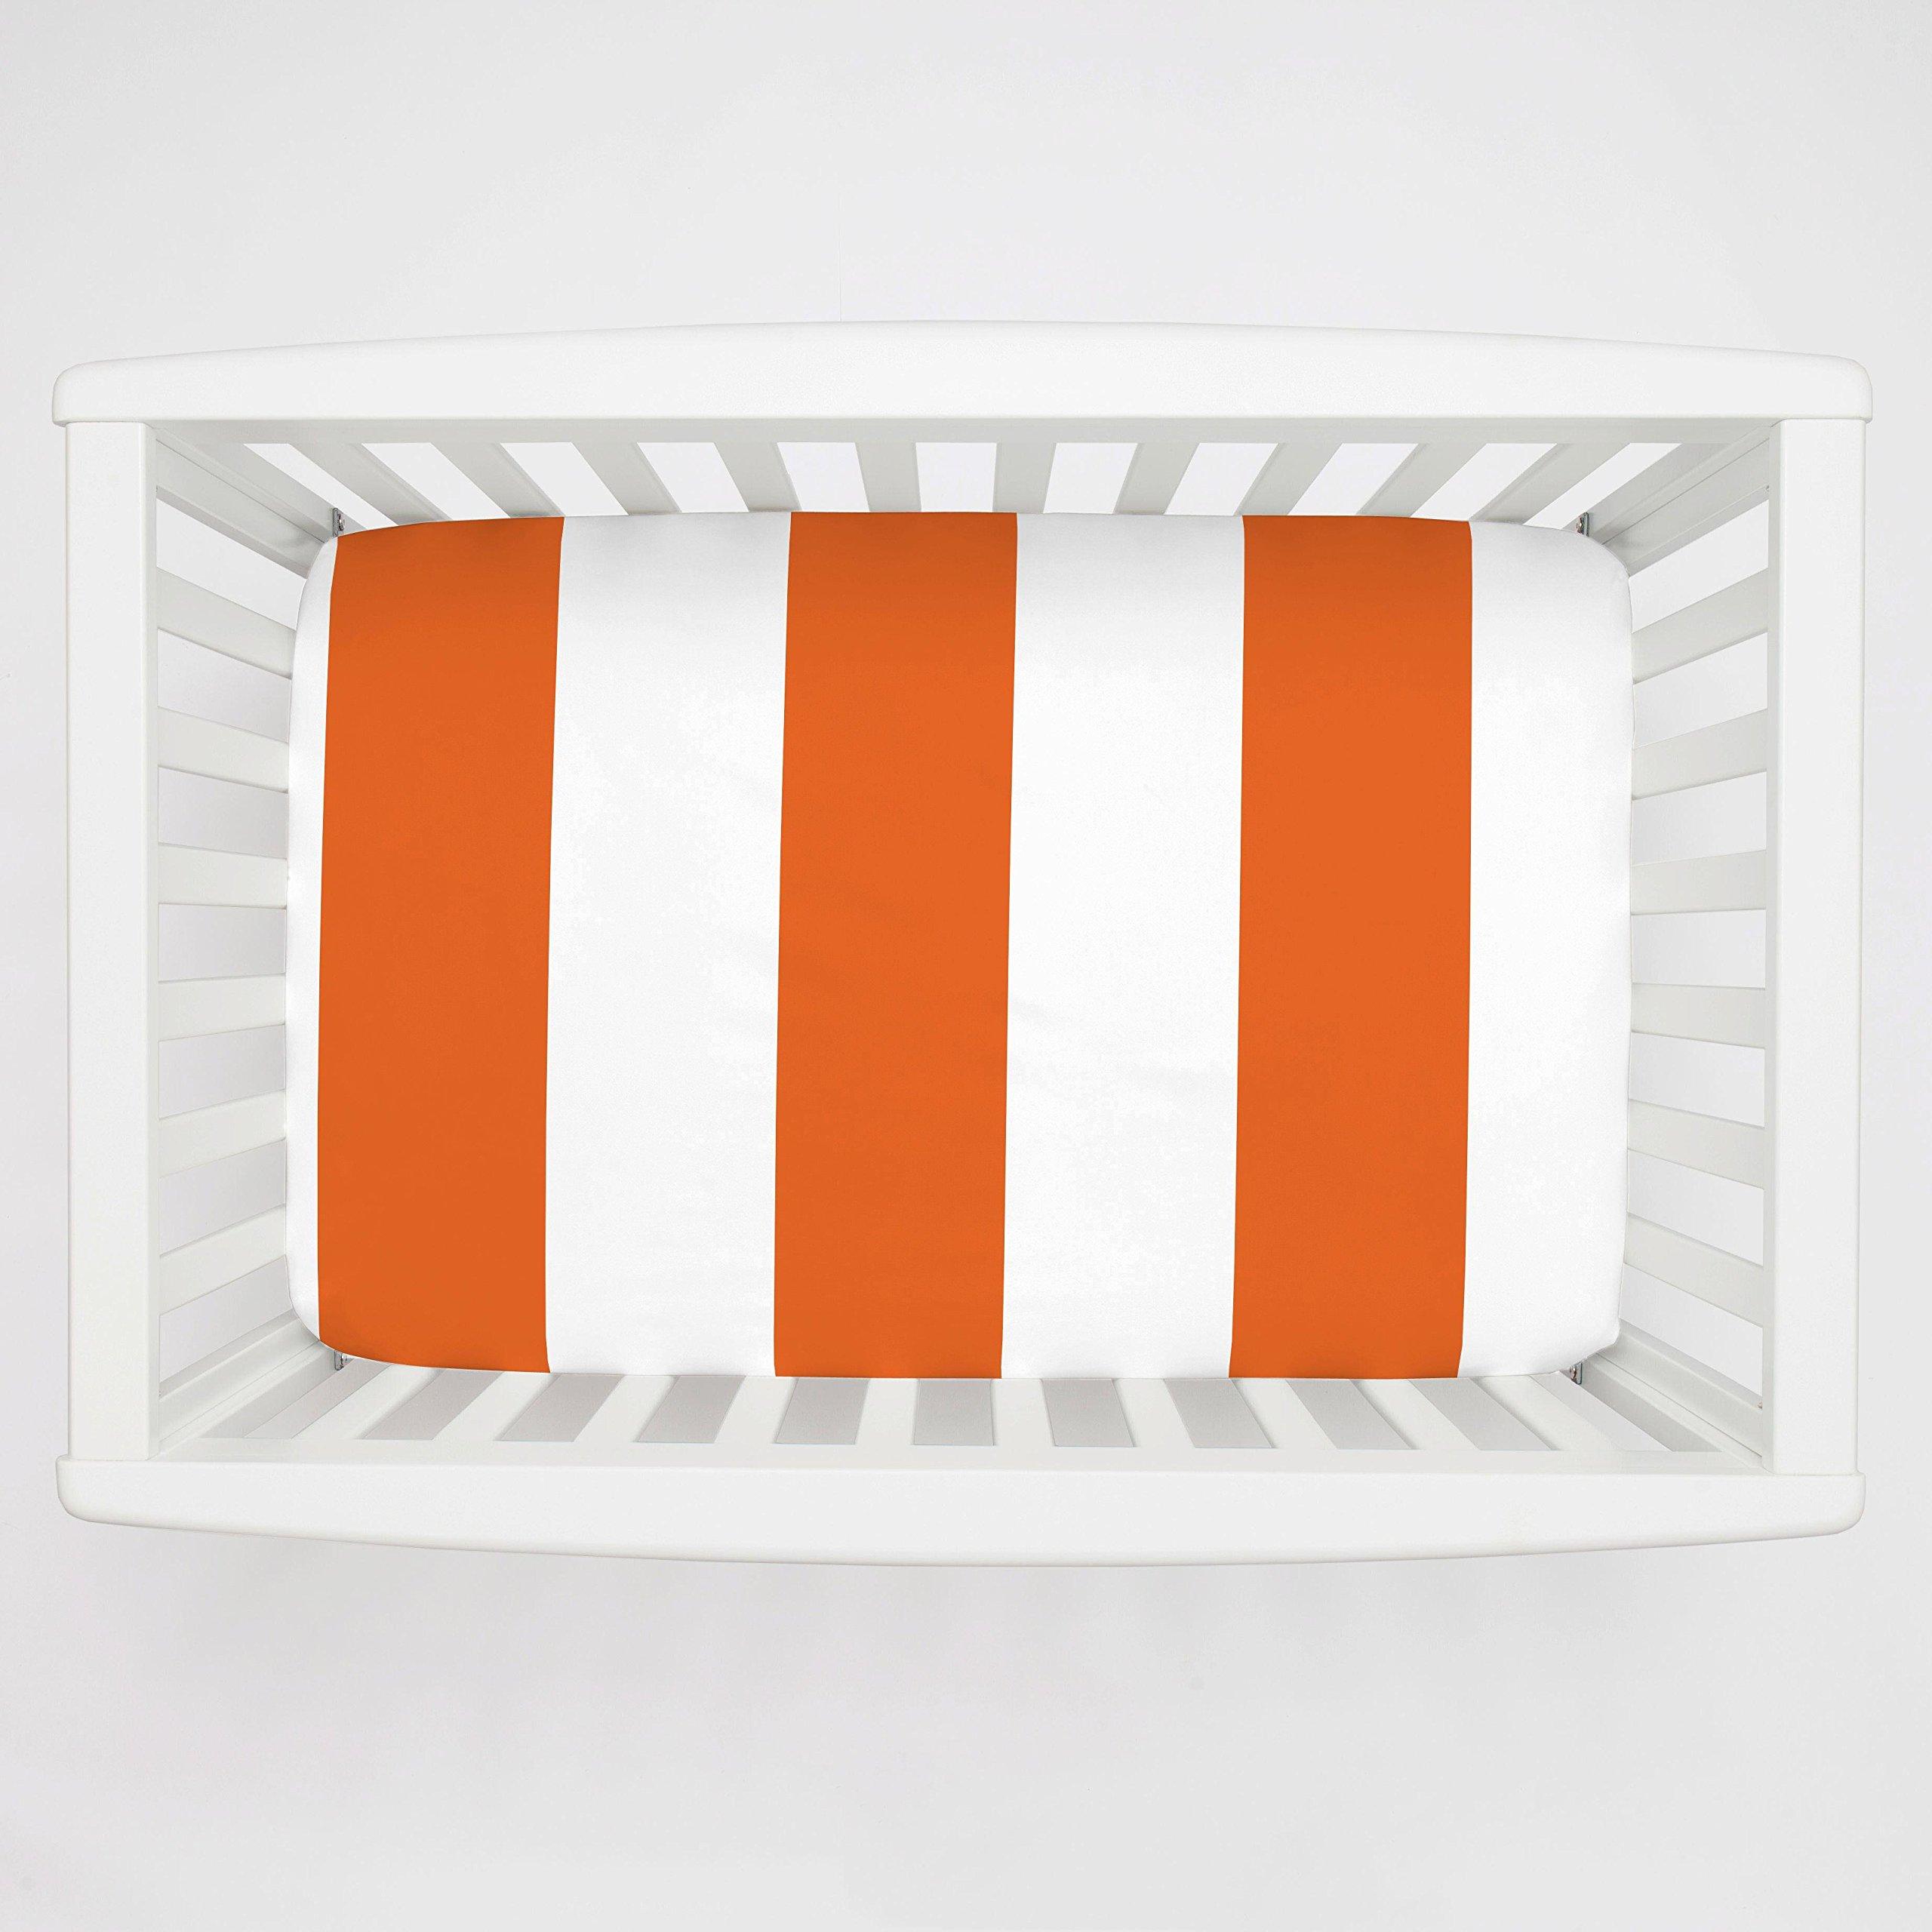 Carousel Designs College Orange Horizontal Stripe Mini Crib Sheet 1-Inch-4-Inch Depth - Organic 100% Cotton Fitted Mini Crib Sheet - Made in the USA